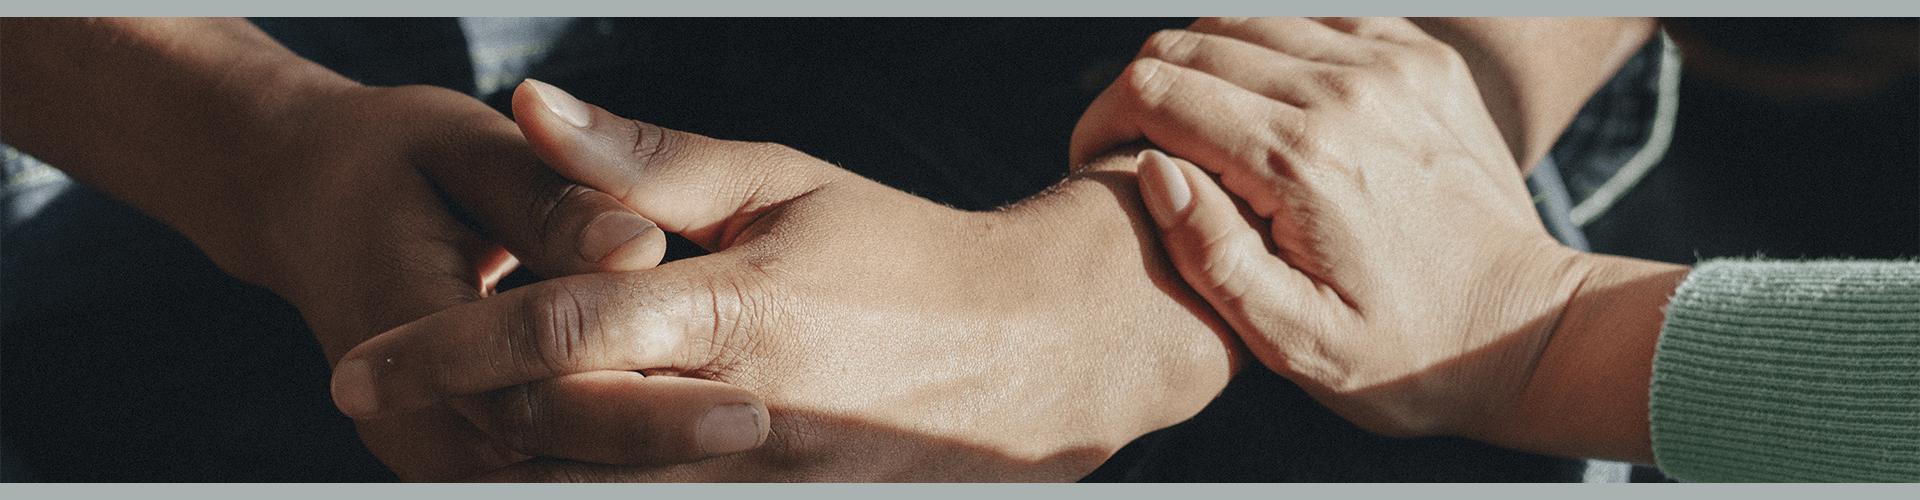 A hand embracing an arm